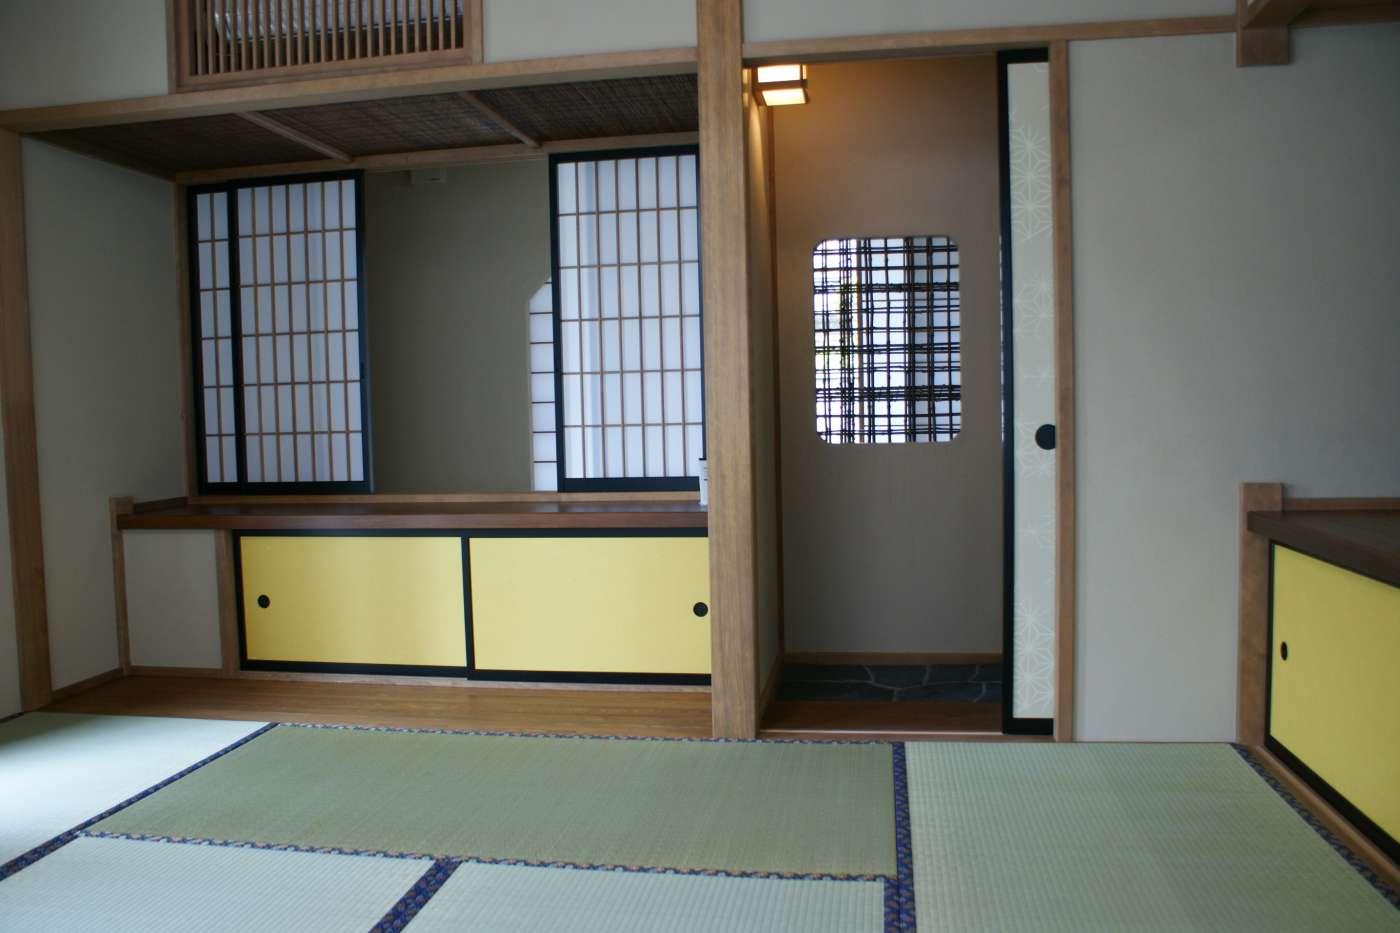 http://sumainomatsuki.com/folder1/12.JPG